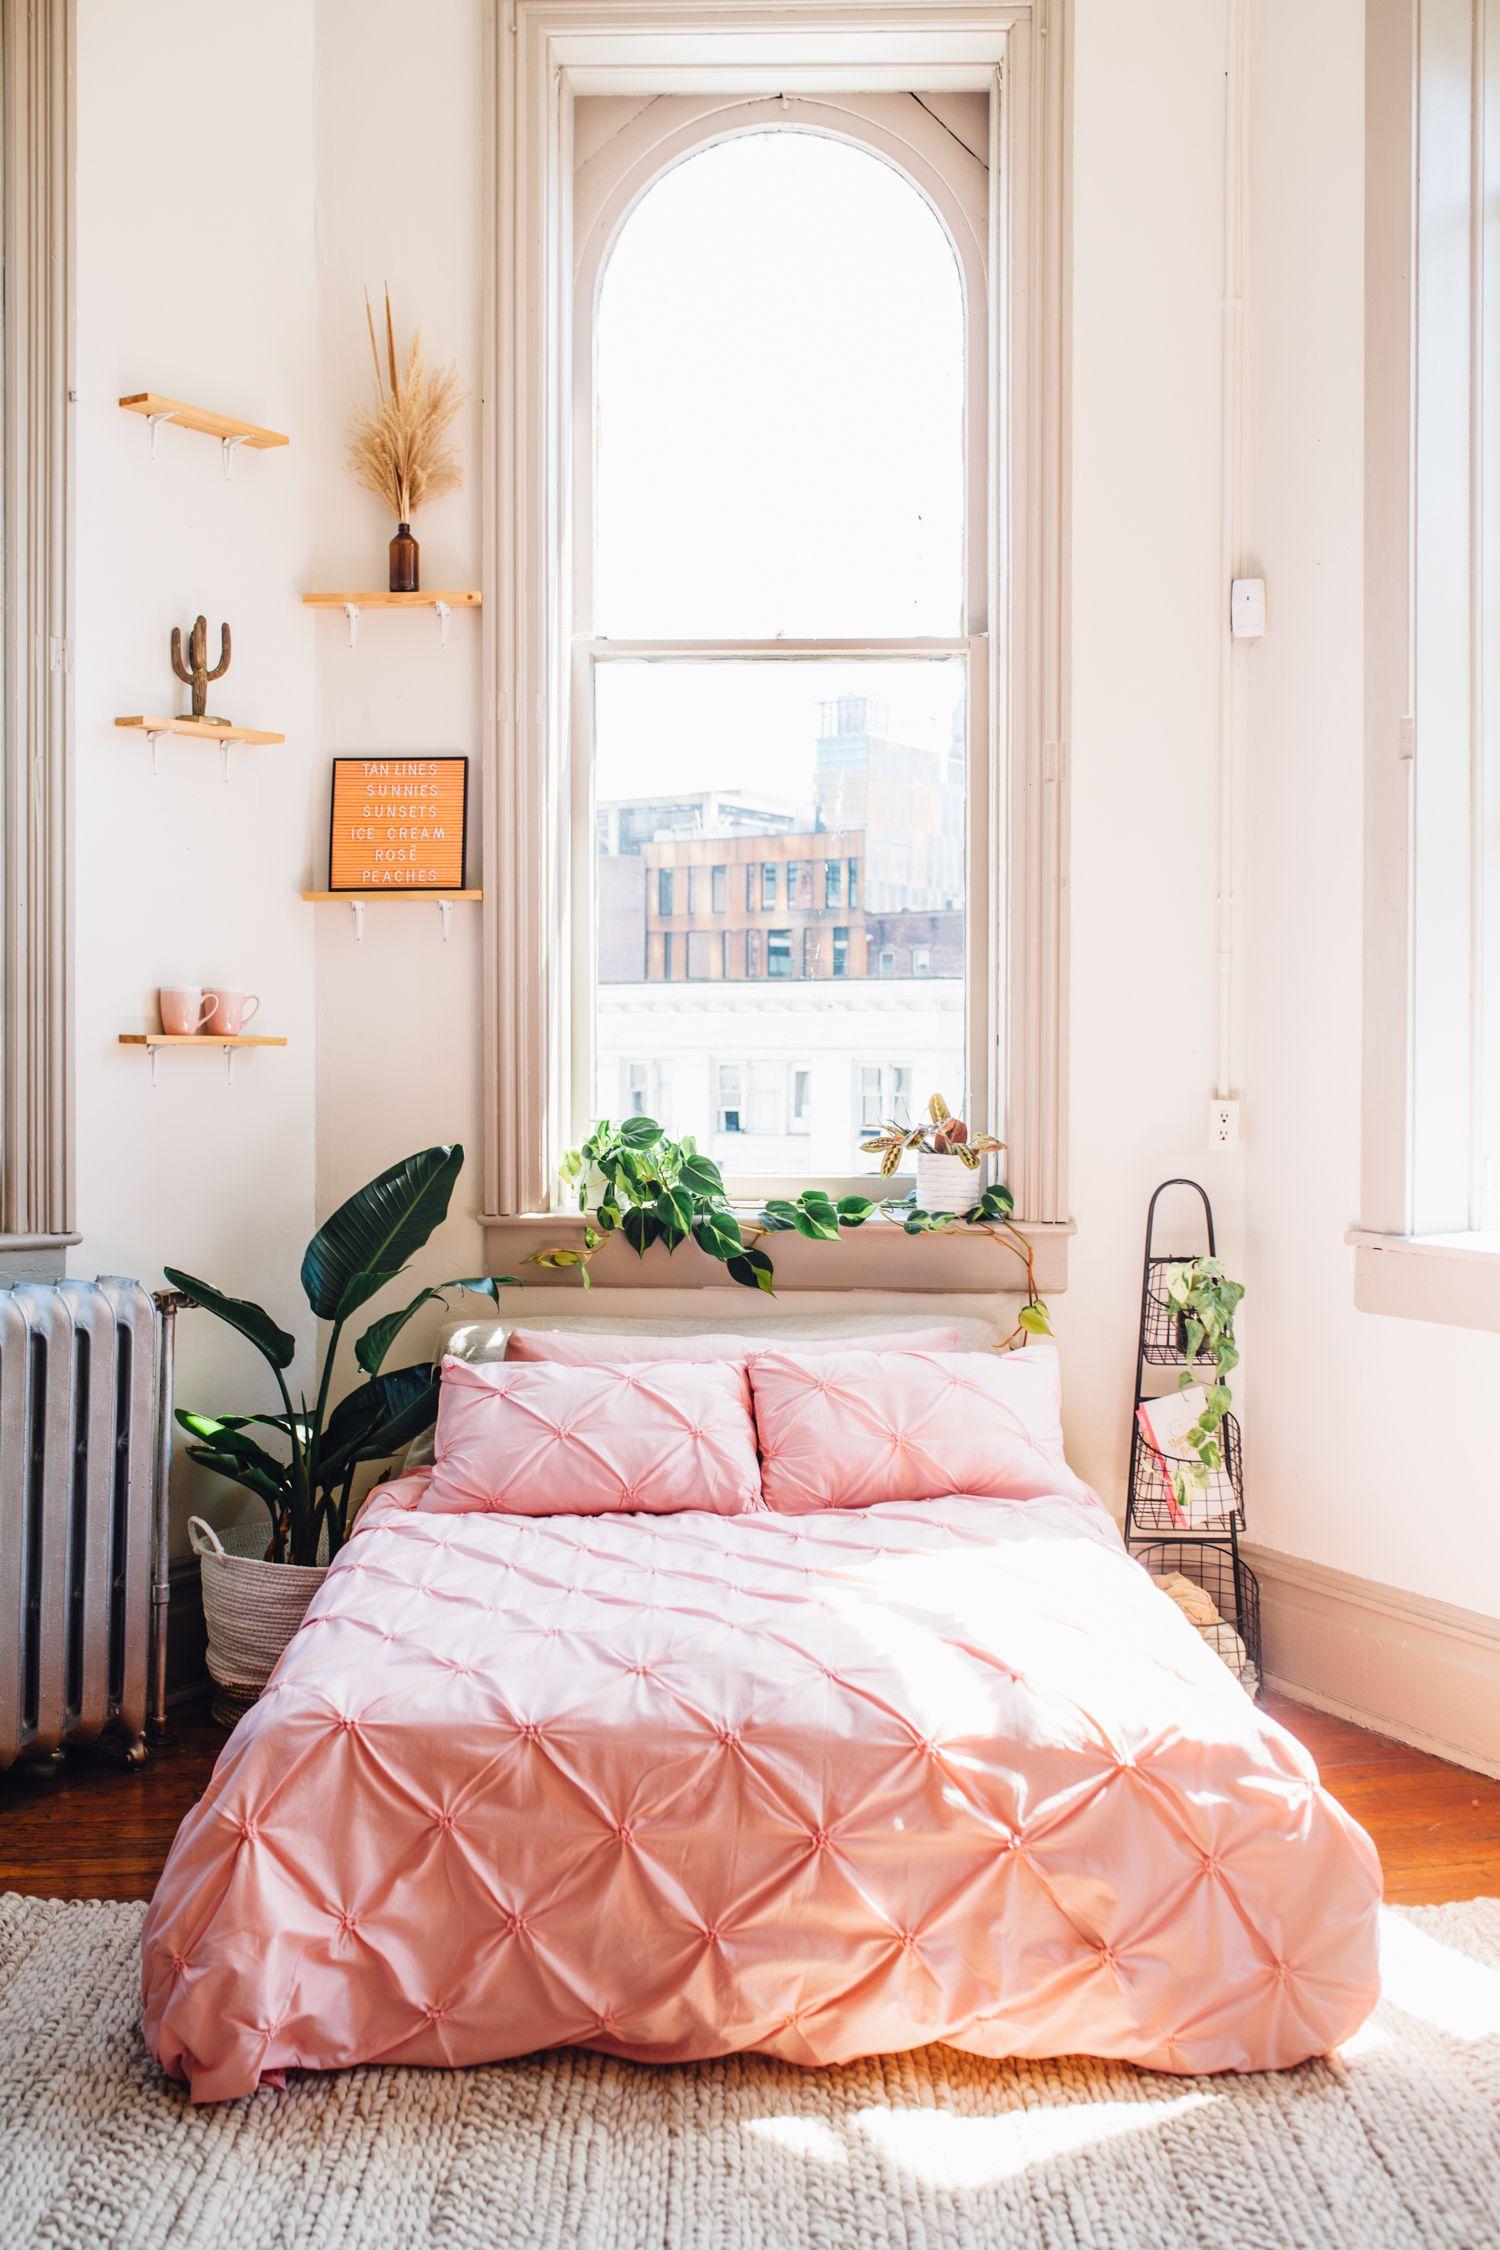 Blush Bedroom with Urban Barn | Interior Design & Architecture ...